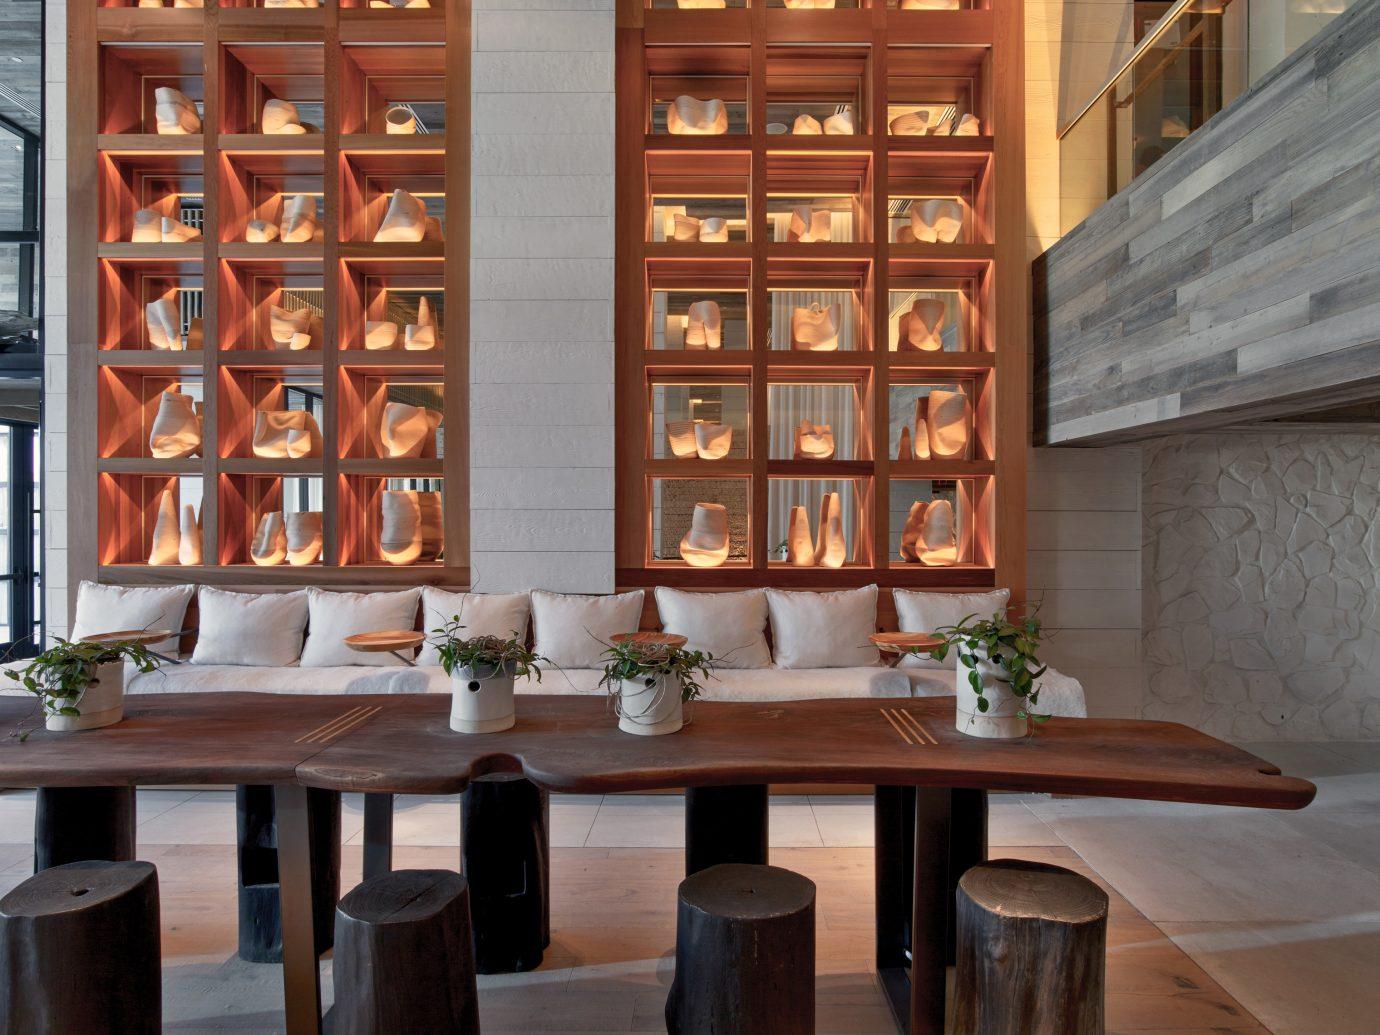 Hotels Romance room dining room furniture wooden hardwood interior design wood table Design